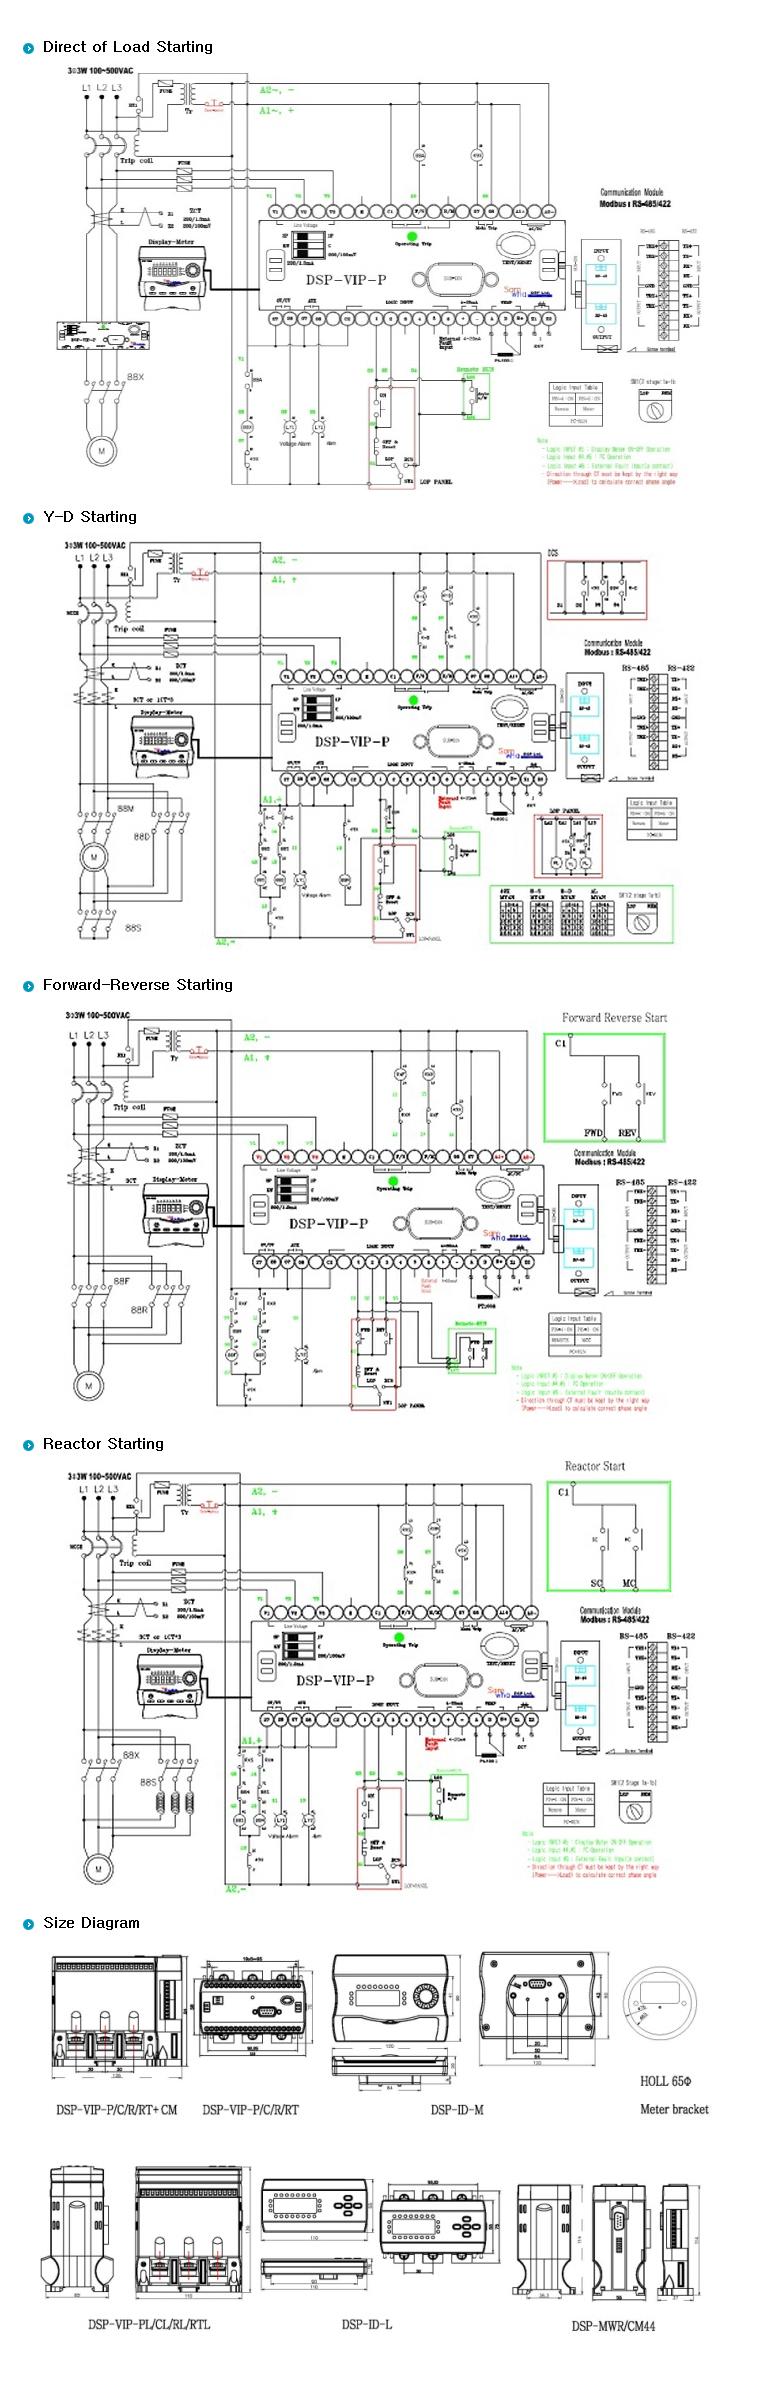 SamWha DSP Power Type,GF,Temp,Short + PC comm.,Pre-maintenance DSP-VIP-PM 2